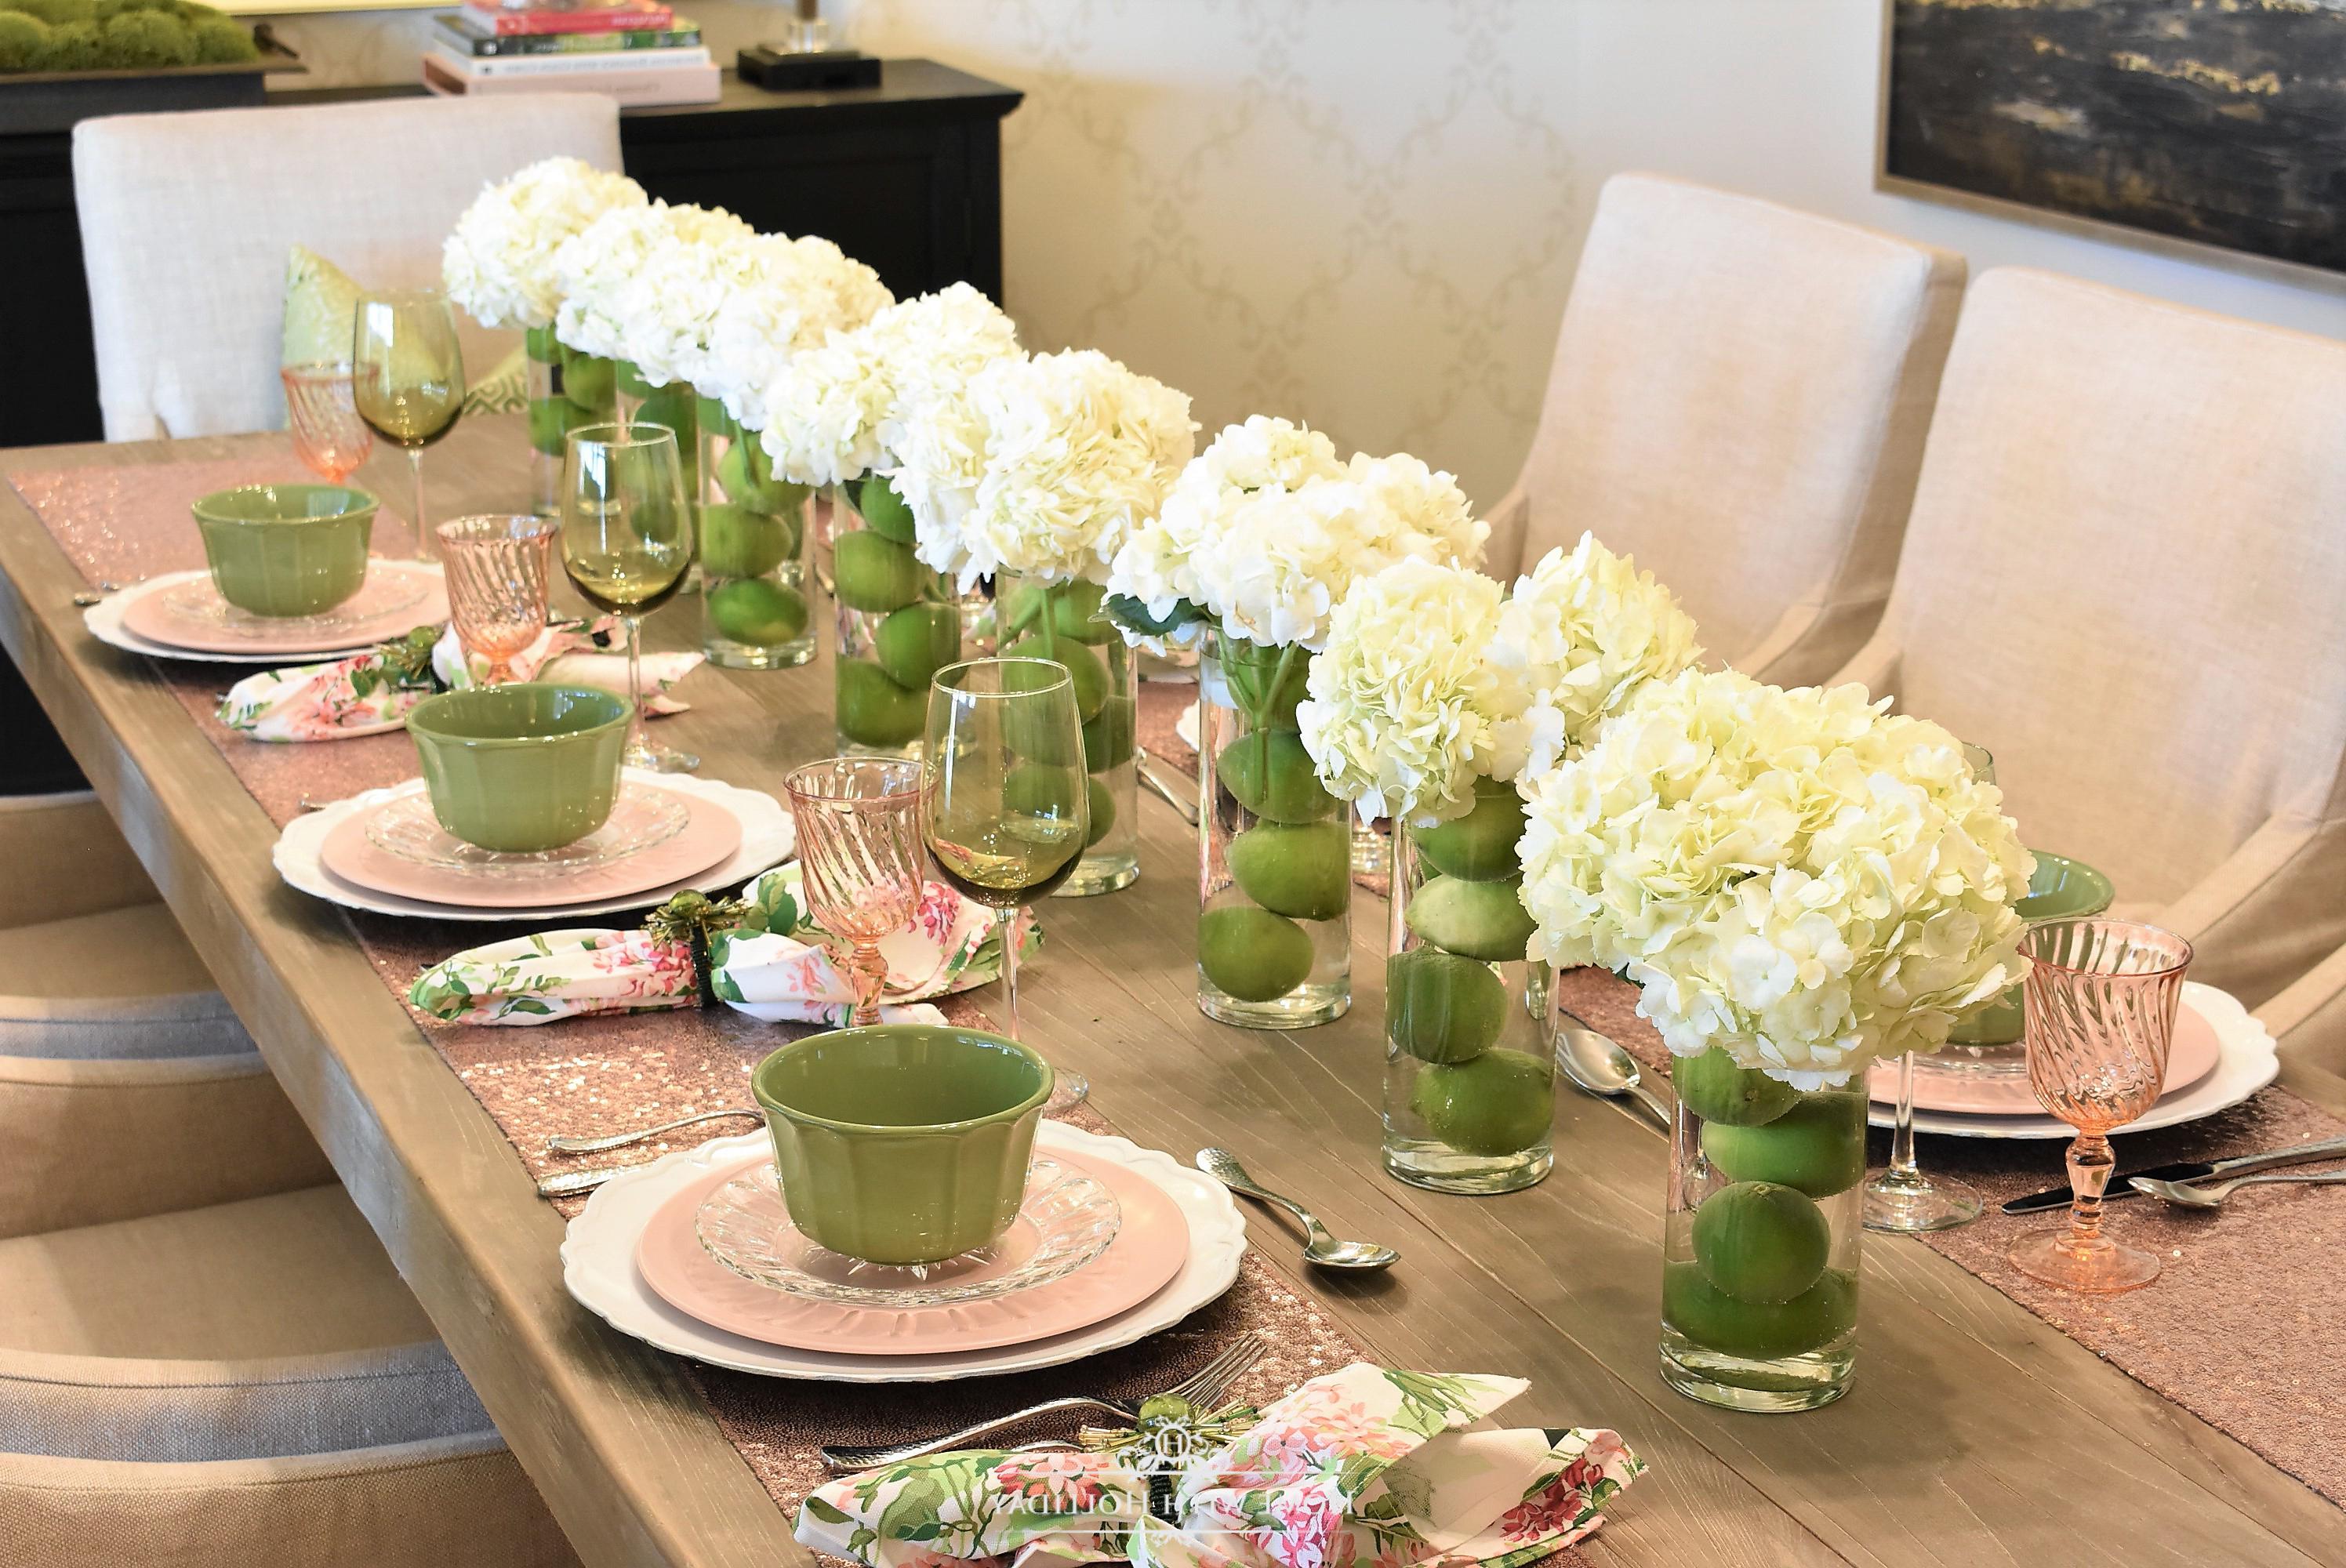 Tischdeko Frühling: die besten Dekorationen